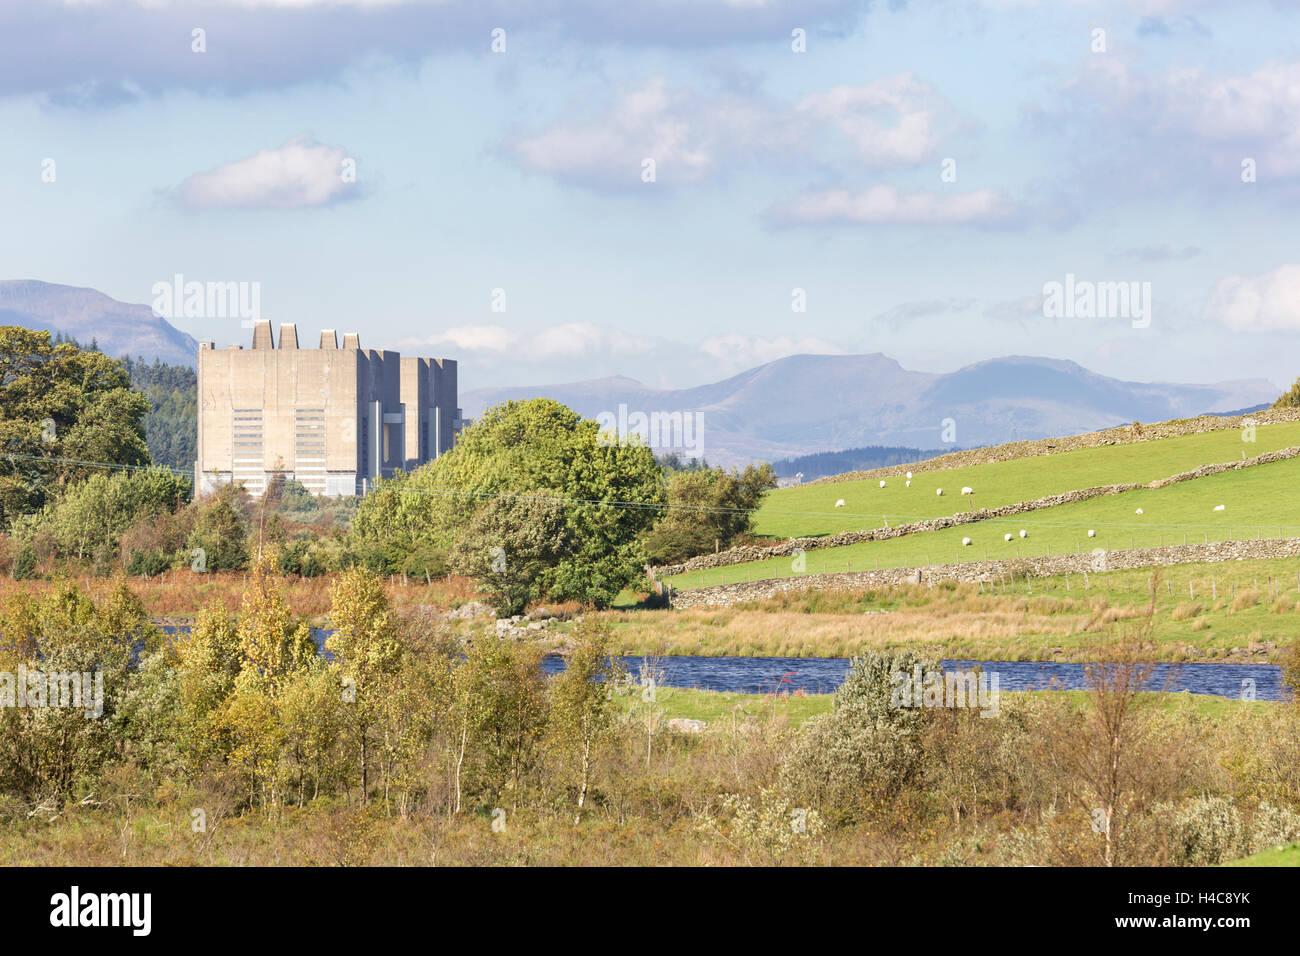 The decommissioned Trawsfynydd Nuclear Power Station, Snowdonia National Park,  Gwynedd, Wales. Stock Photo